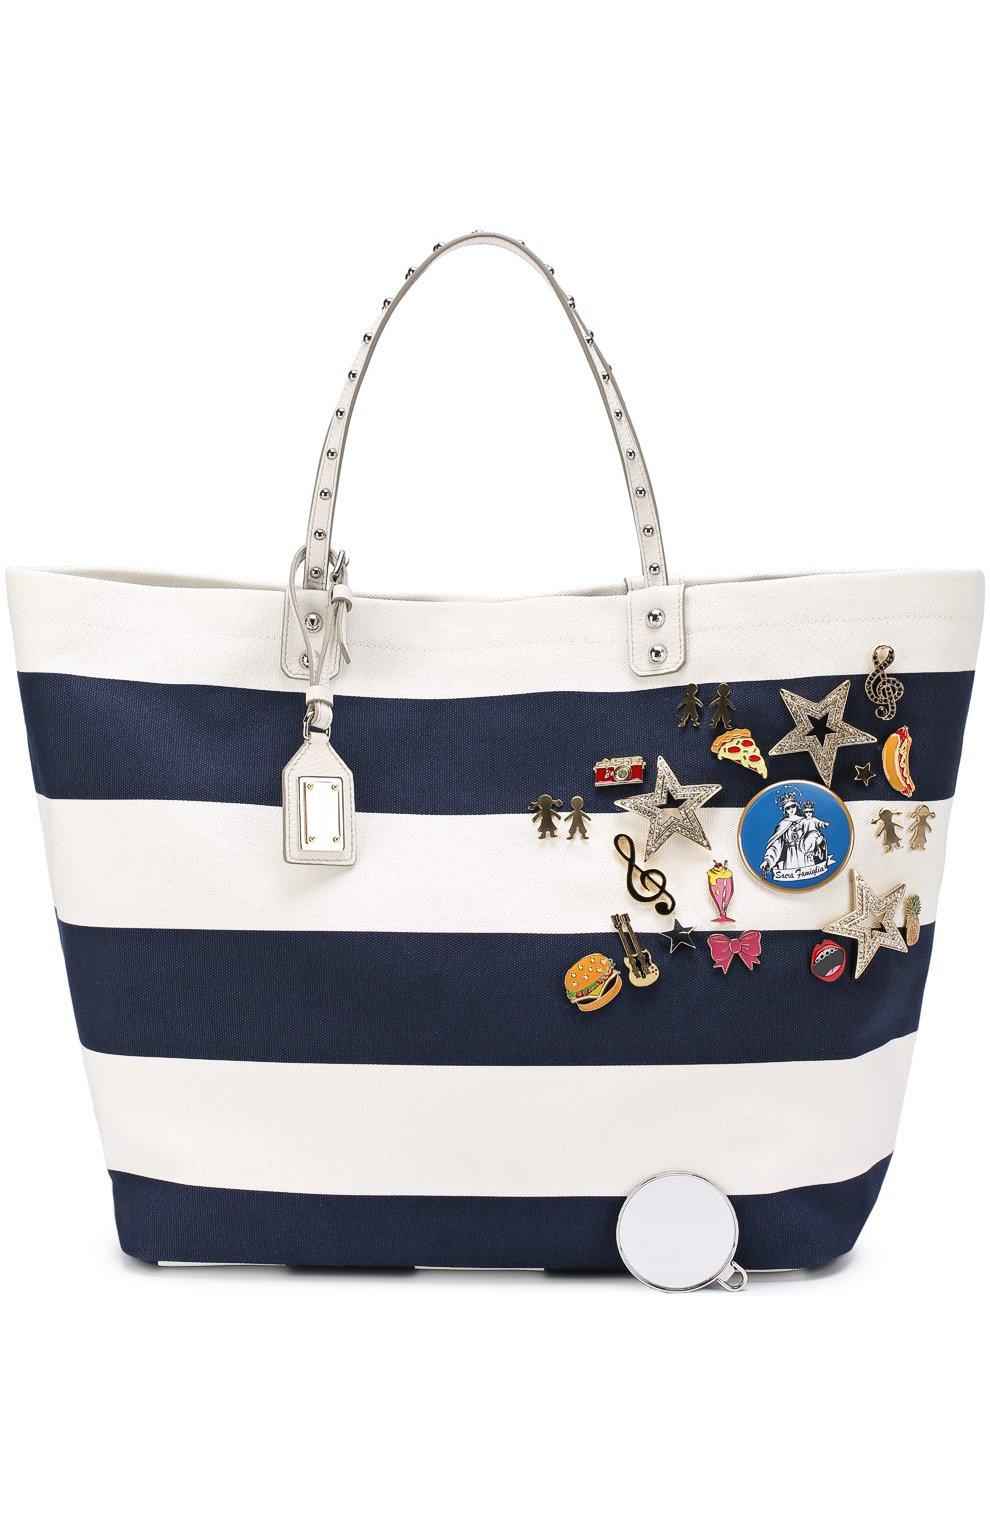 Текстильная сумка Beatrice с металлическим декором Dolce & Gabbana синяя цвета | Фото №4